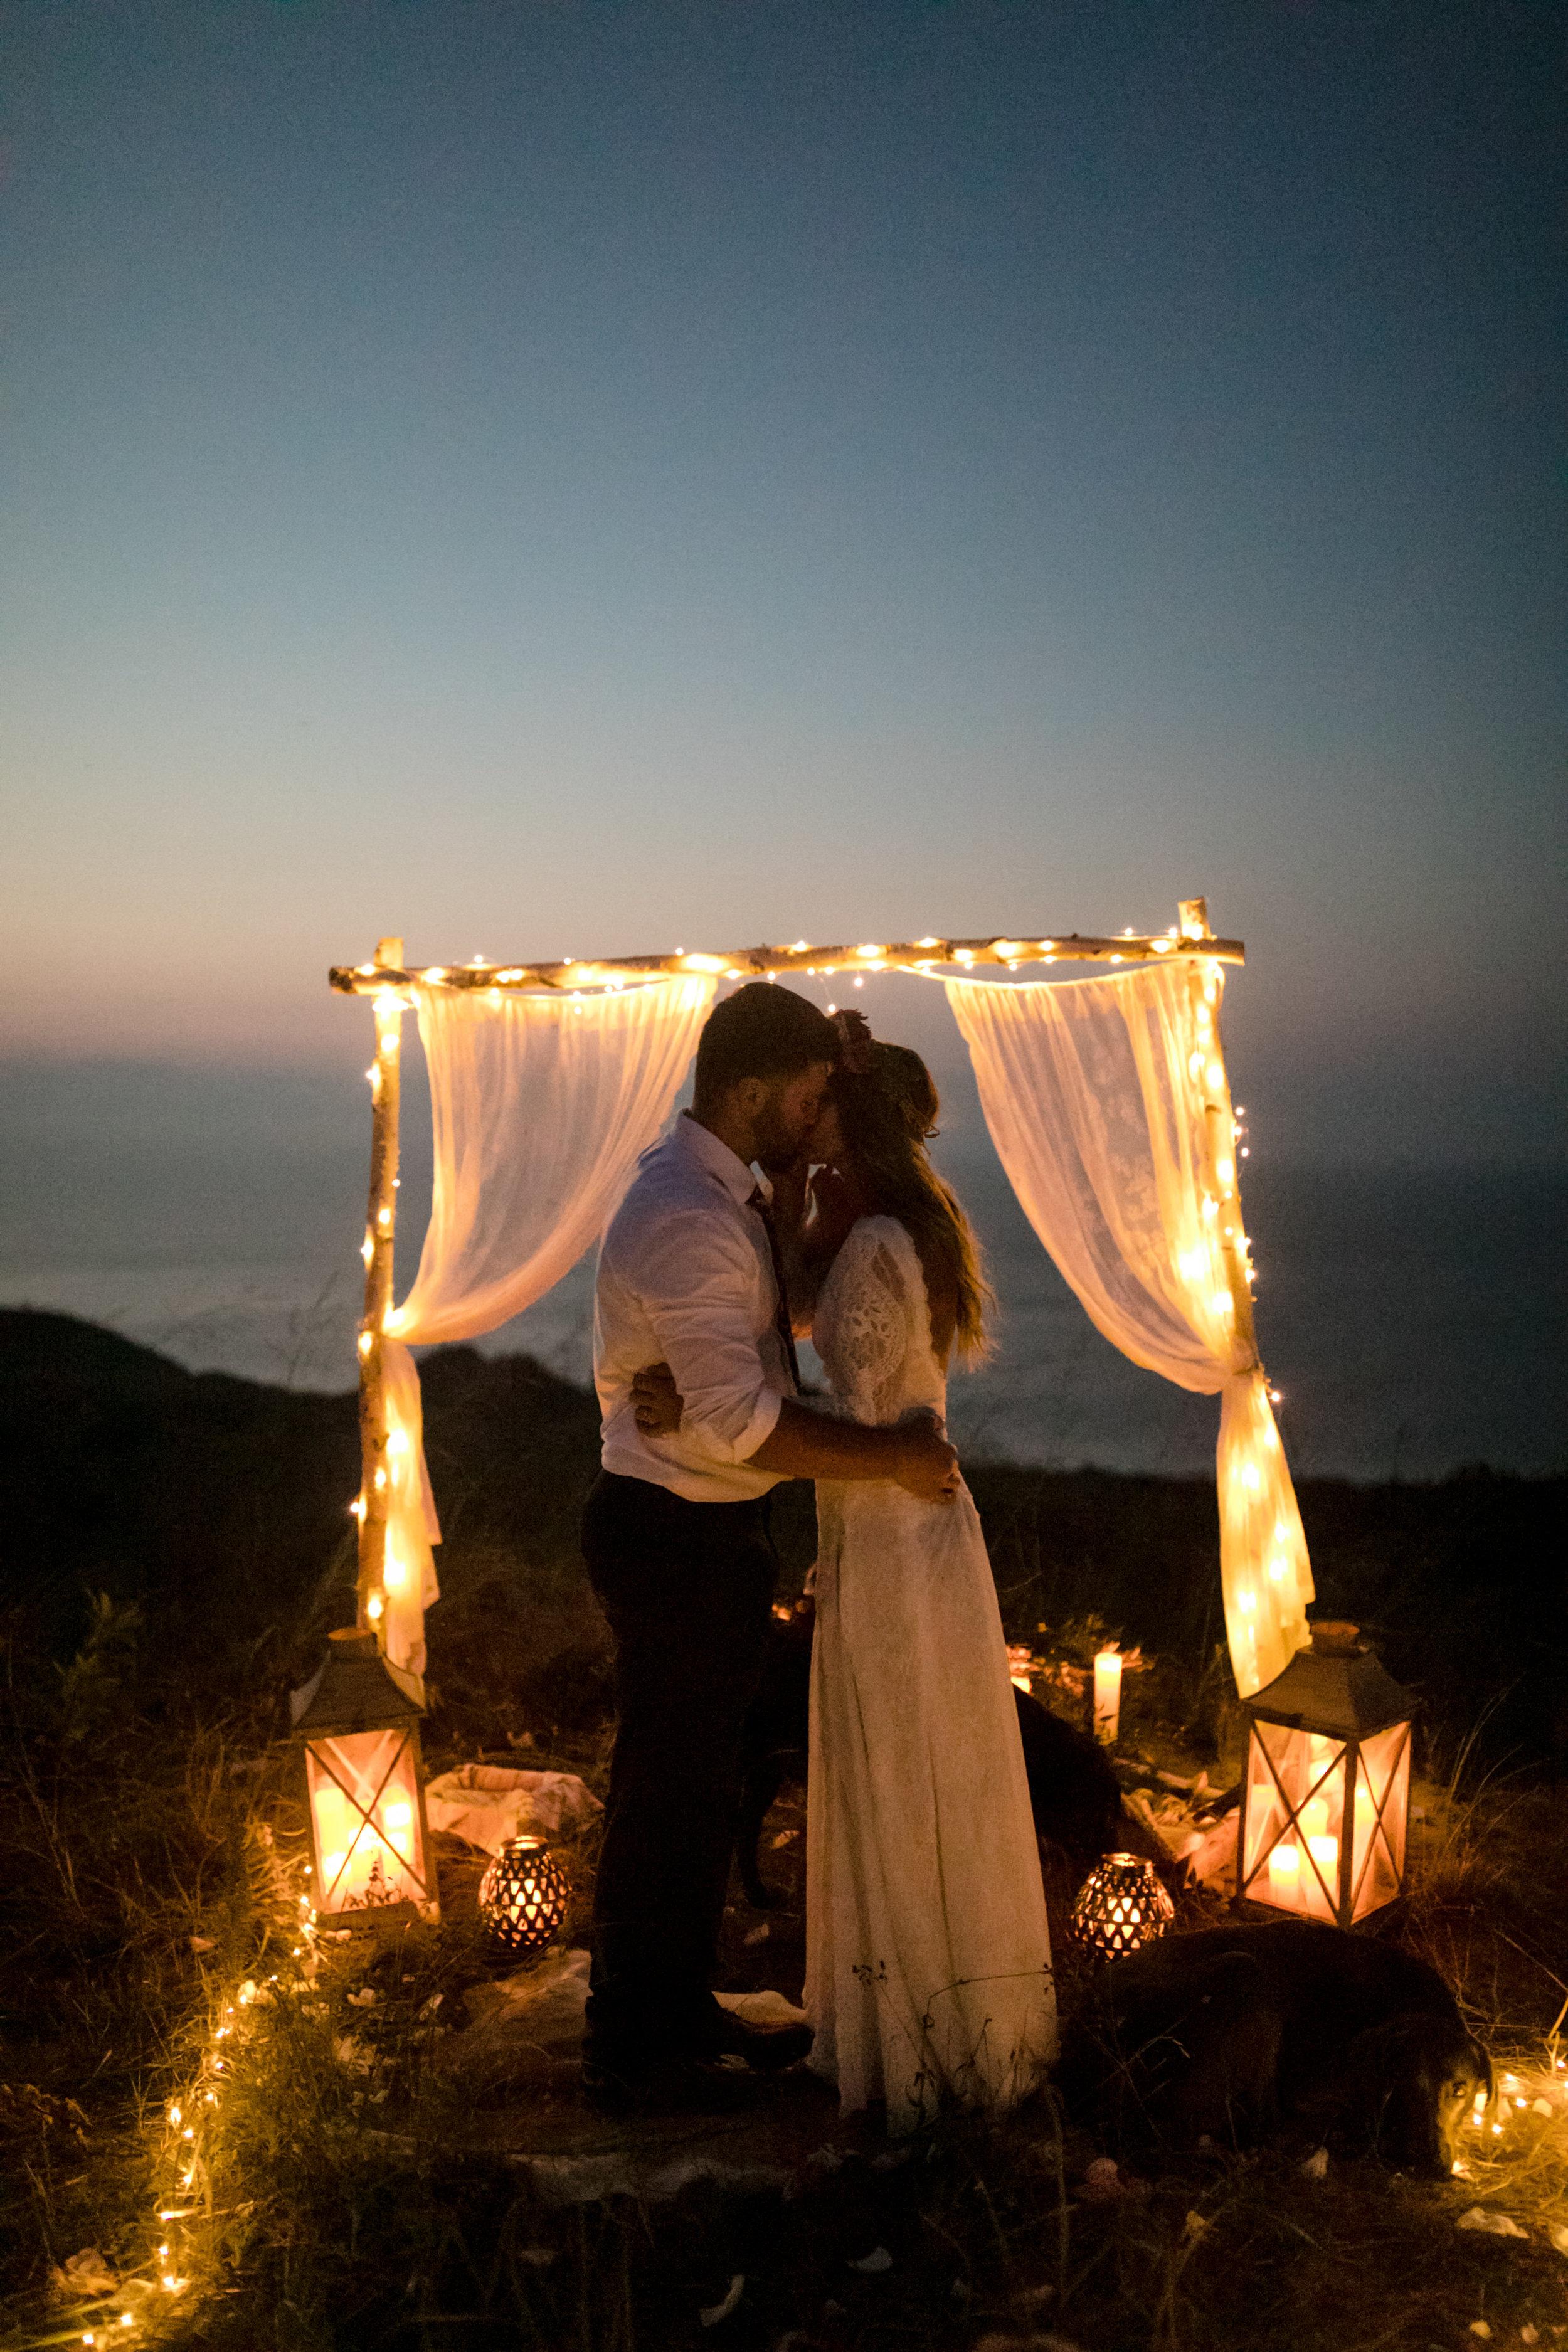 michigan-emotive-photographer-moonlight-elopement-mariha-hunter-294.jpg